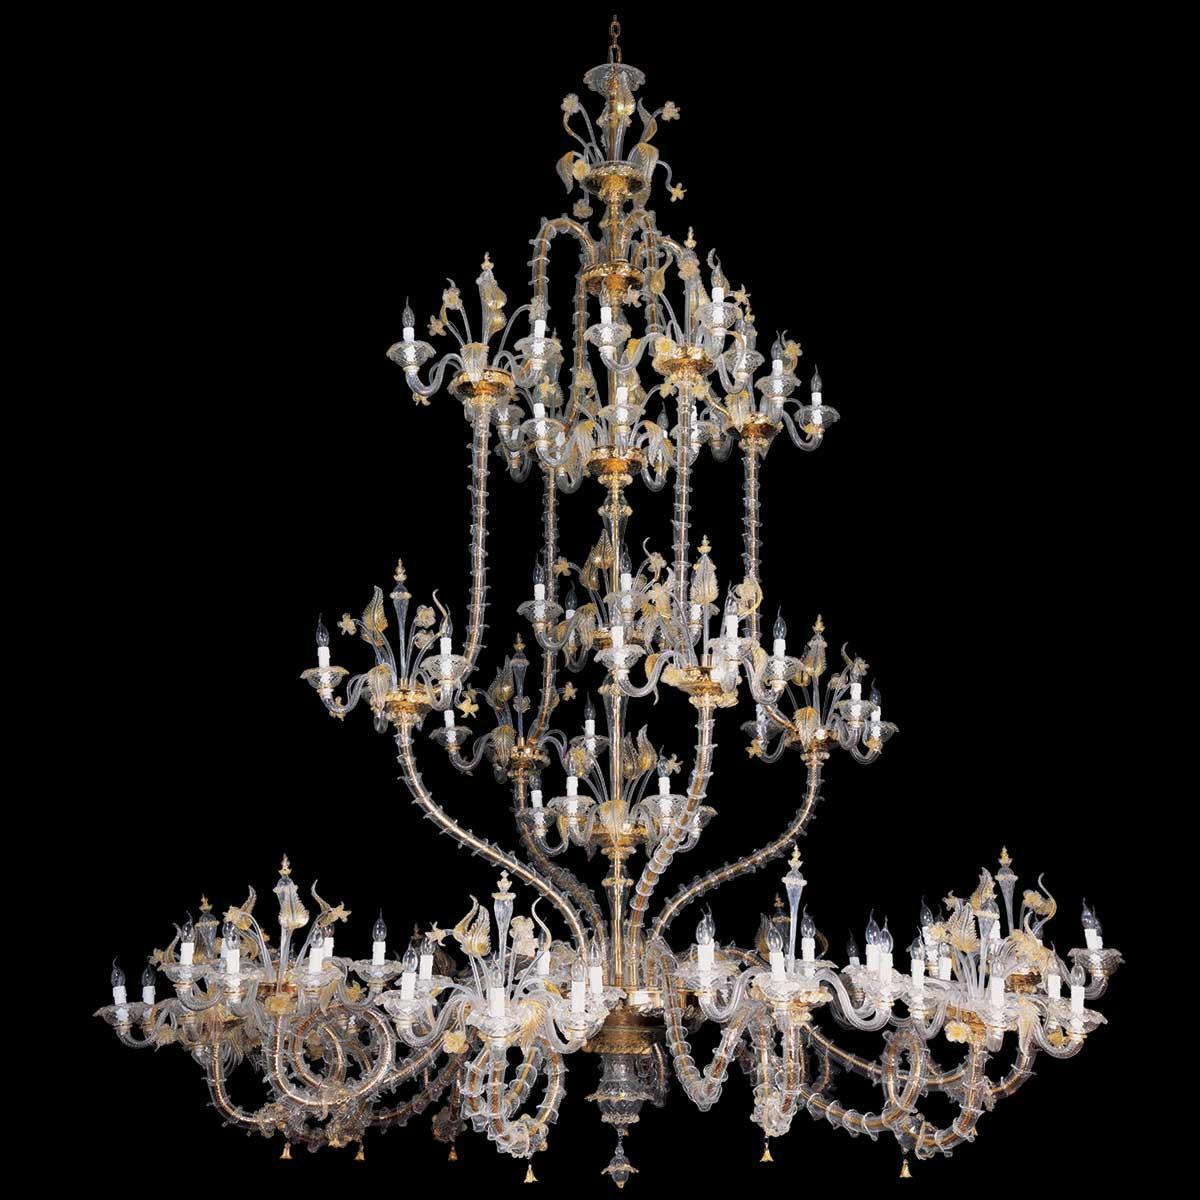 """Fenrir"" Murano glass chandelier - 111 light - transparent and gold"